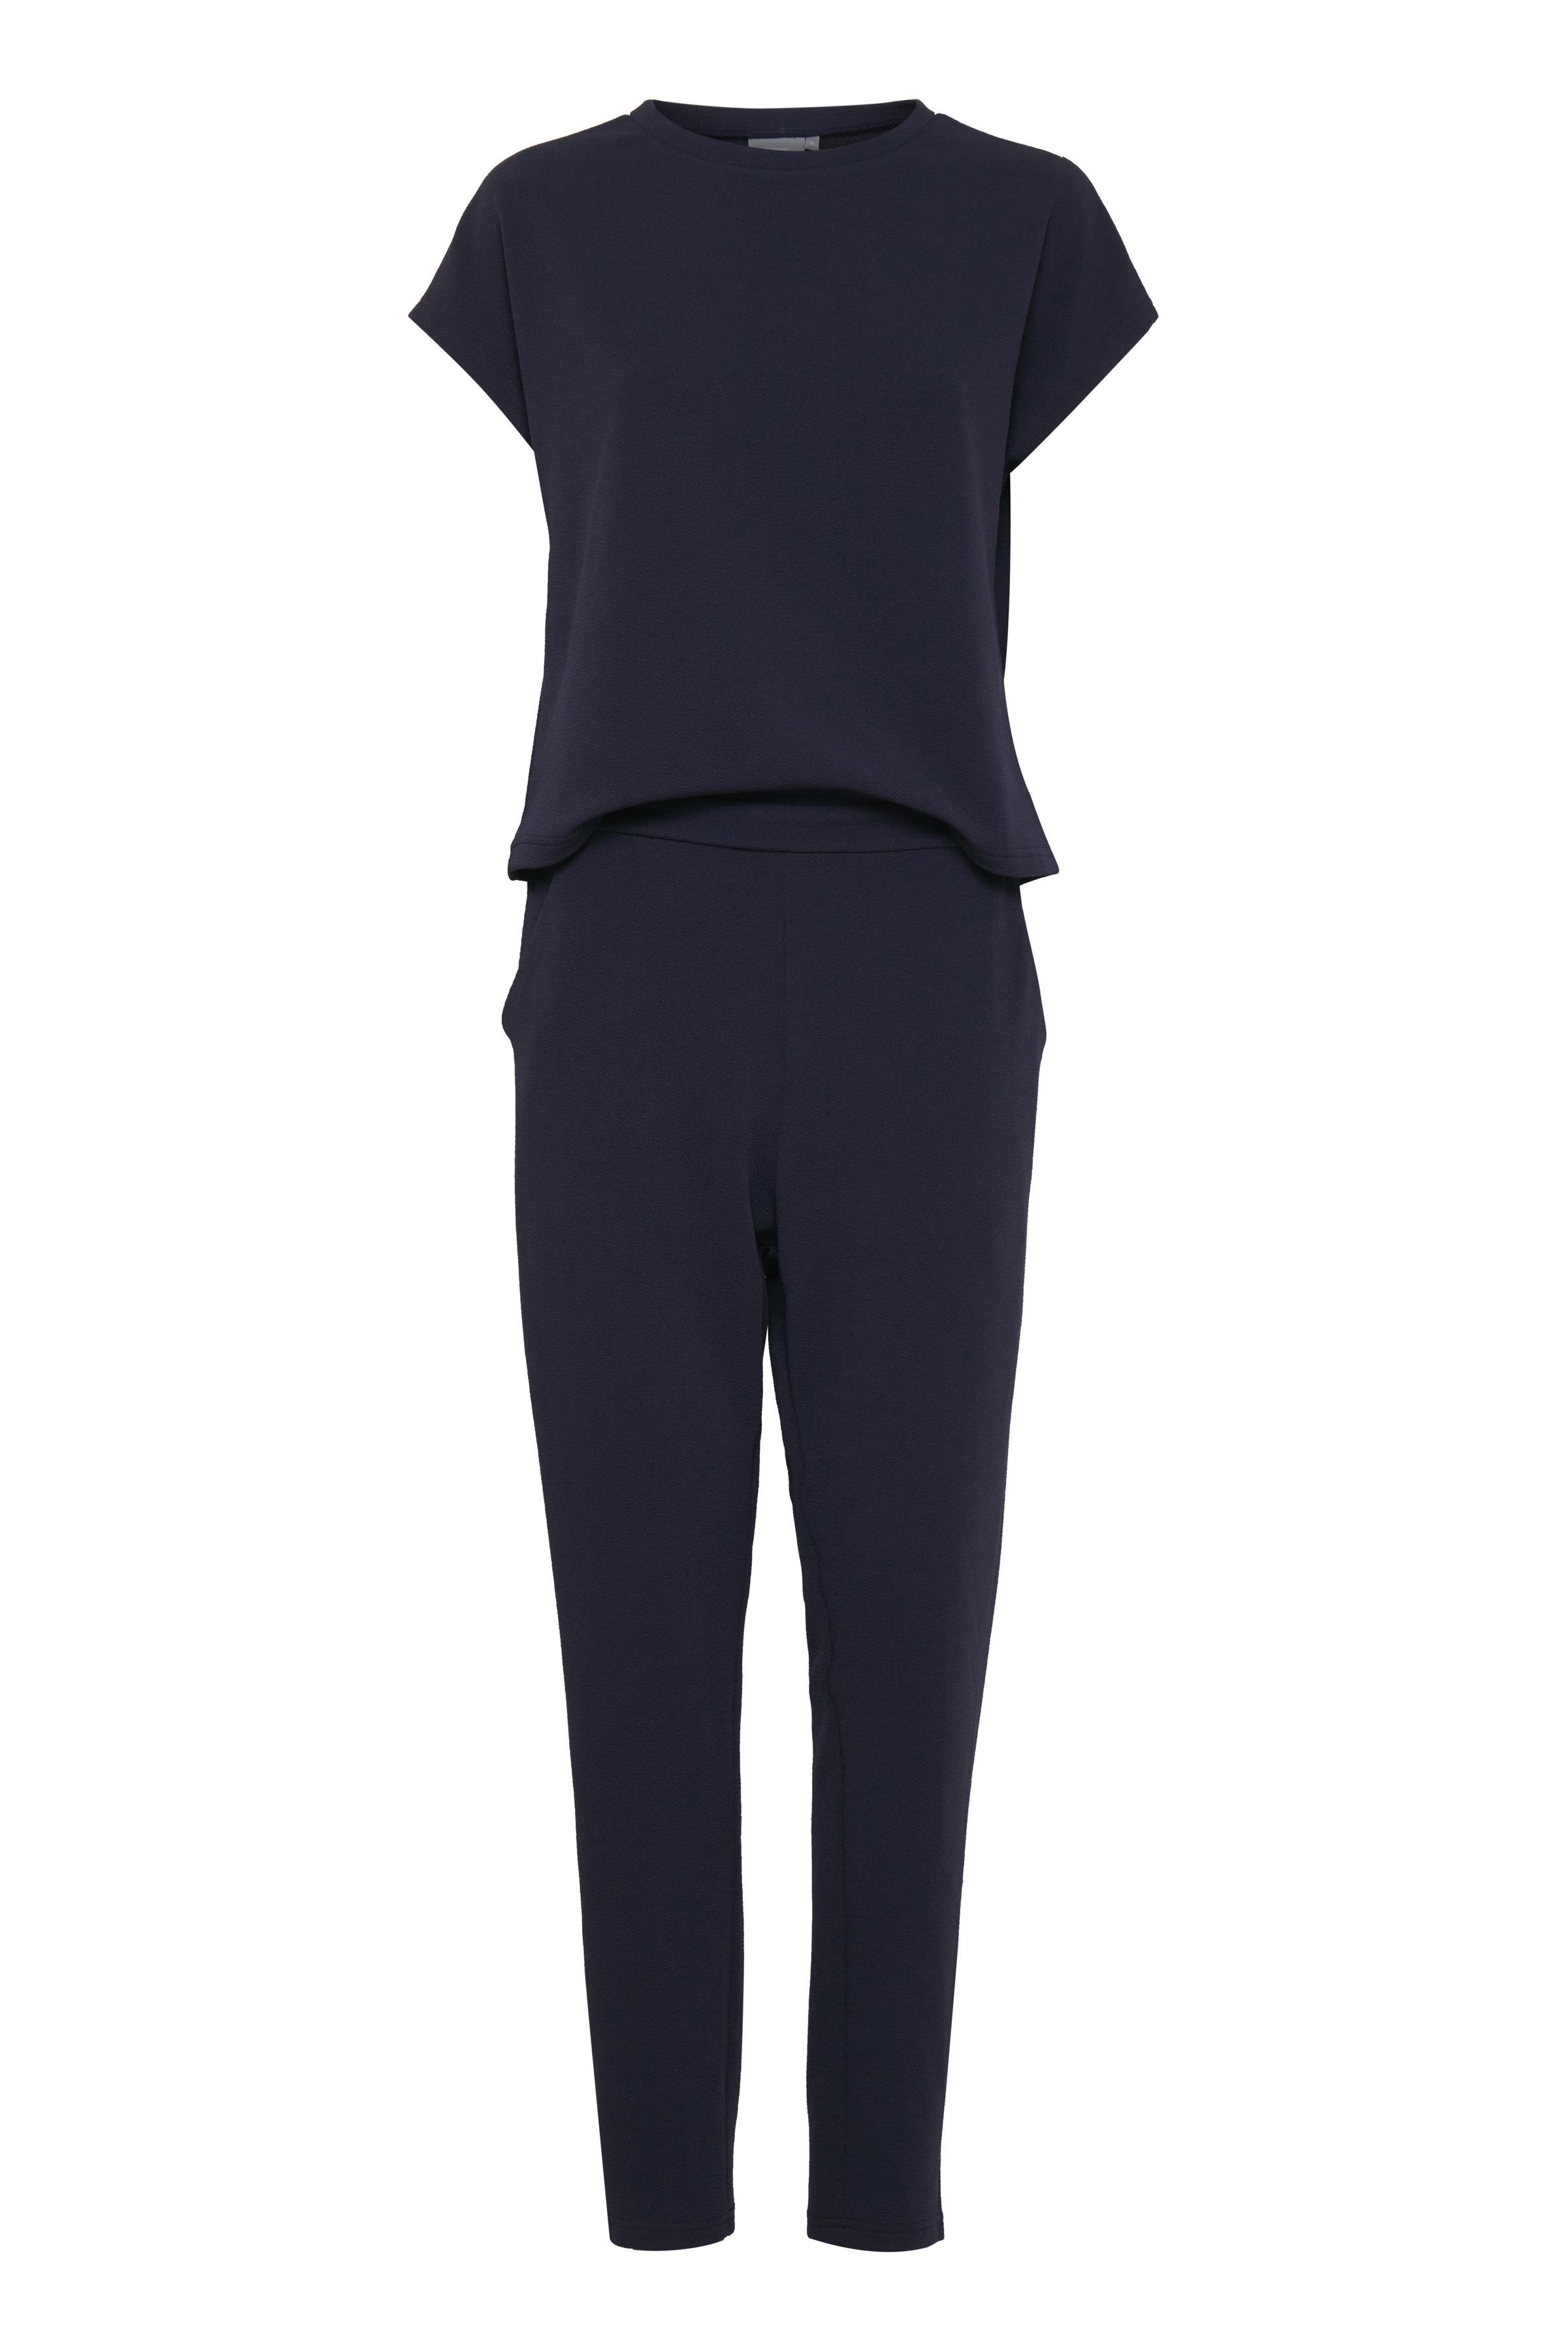 Copenhagen Night Jumpsuit from b.young – Buy Copenhagen Night Jumpsuit from size S-XXL here